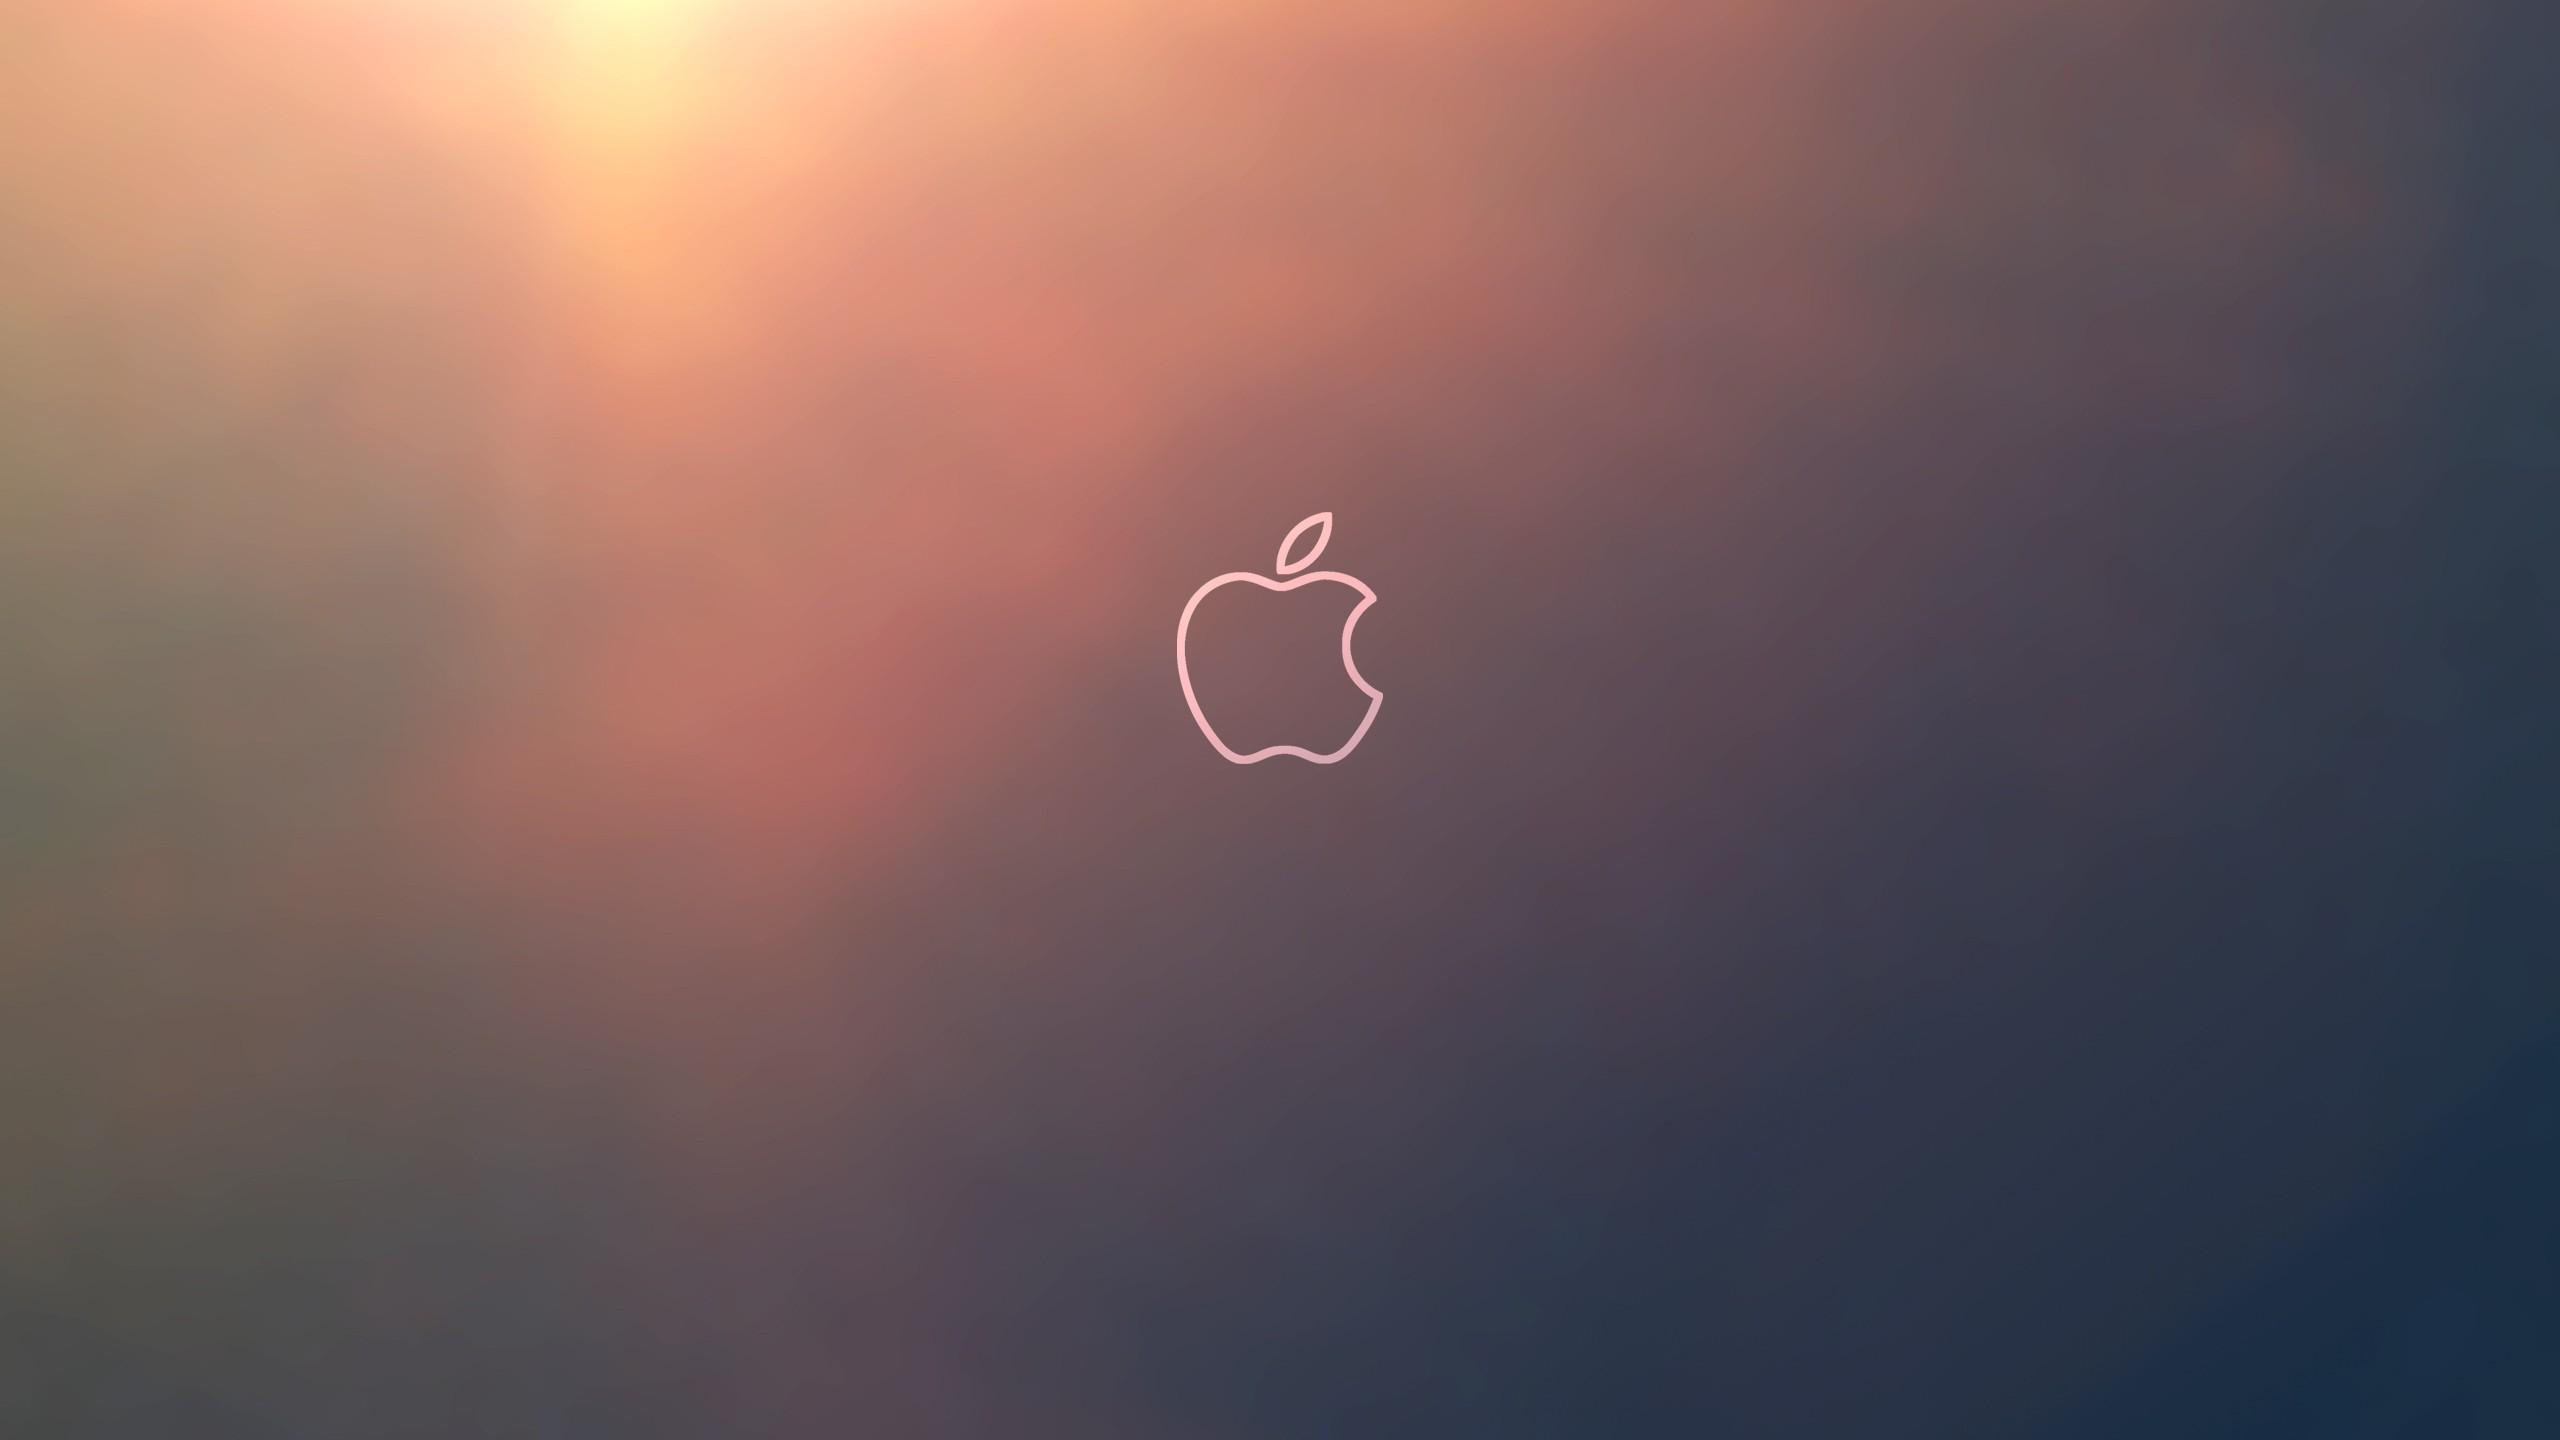 Apple logo outline computer hd wallpaper 2560x jpg 287781 2560x1440